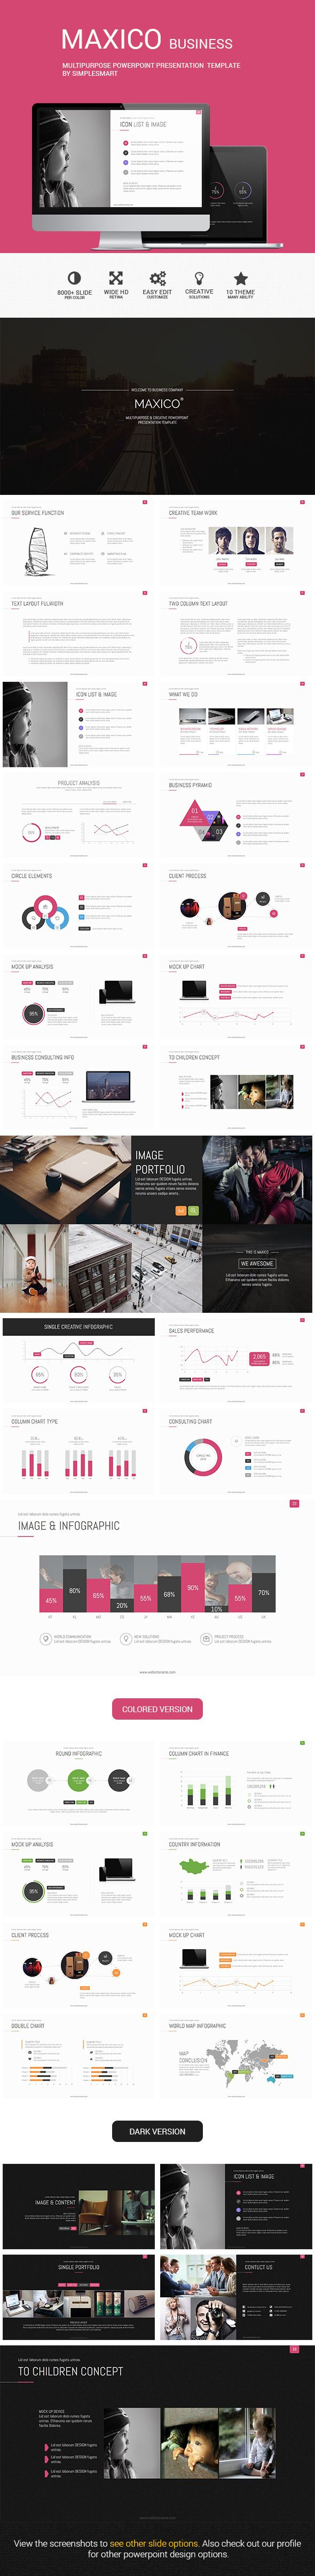 MAXICO - Multipurpose Presentation Template PowerPoint Template / Theme / Presentation / Slides / Background / Power Point #powerpoint #template #theme